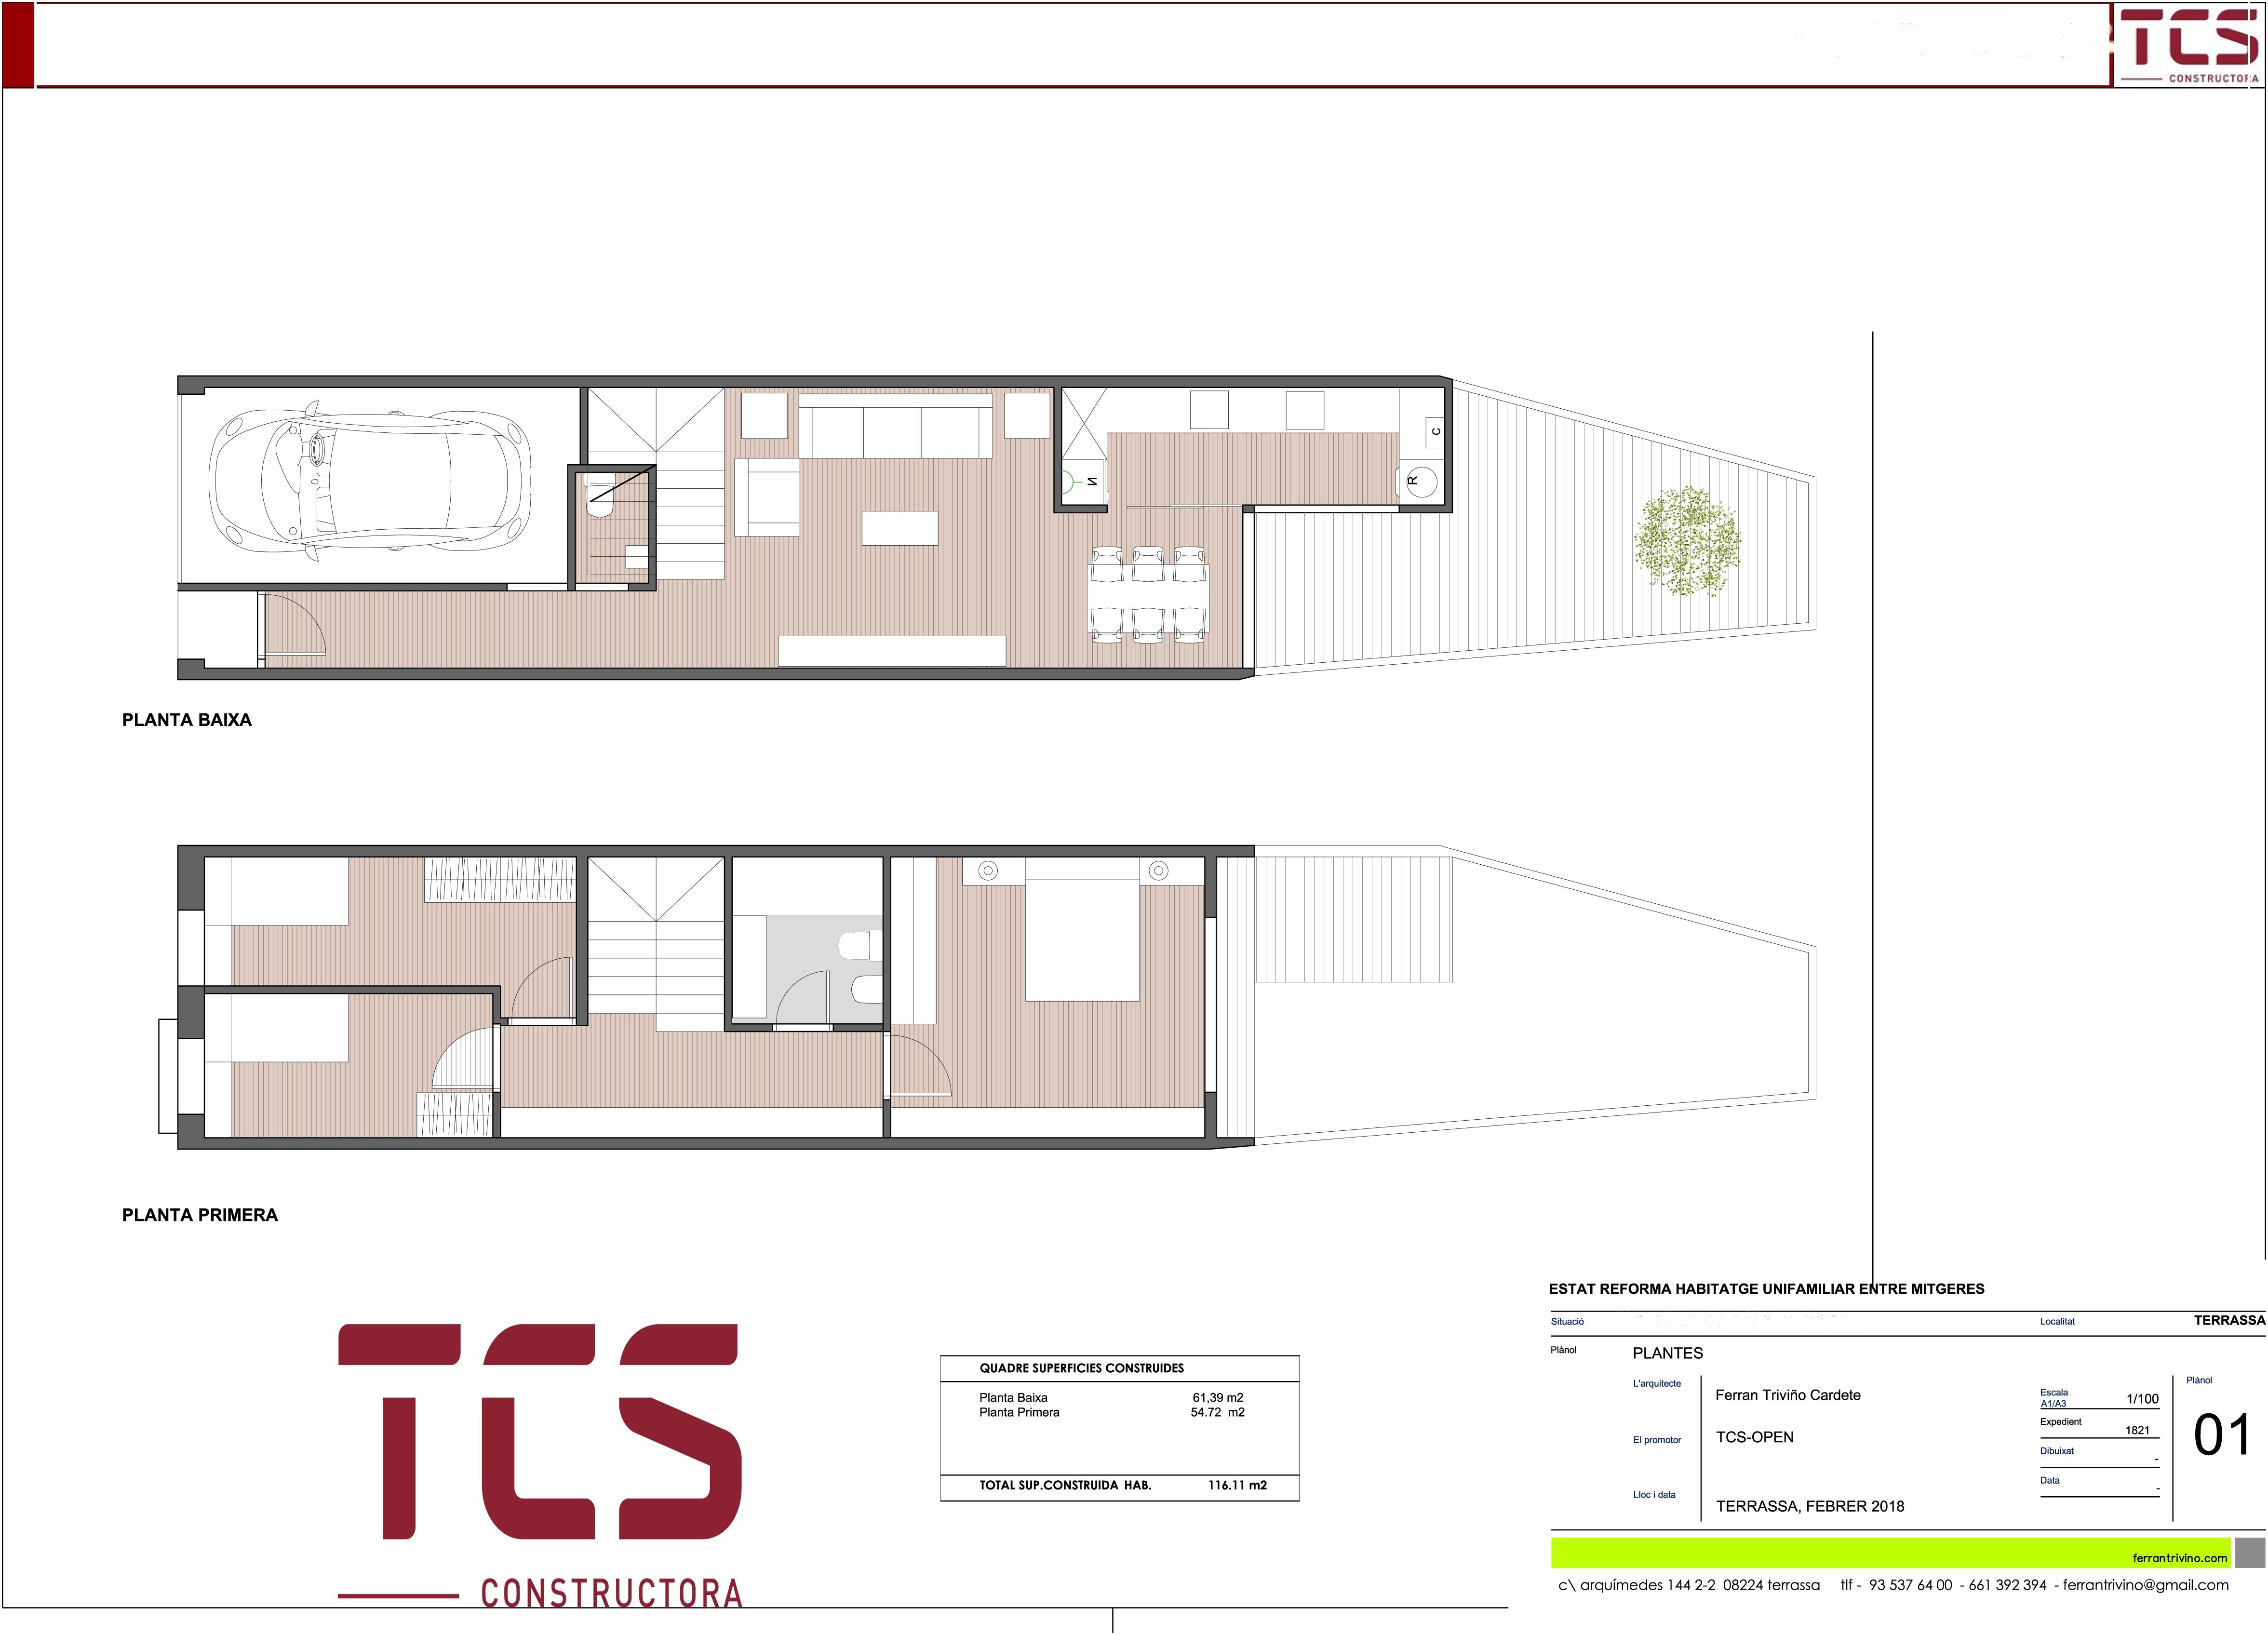 Casa obra nueva en centro terrassa finques opengesfinver - Obra nueva en terrassa ...